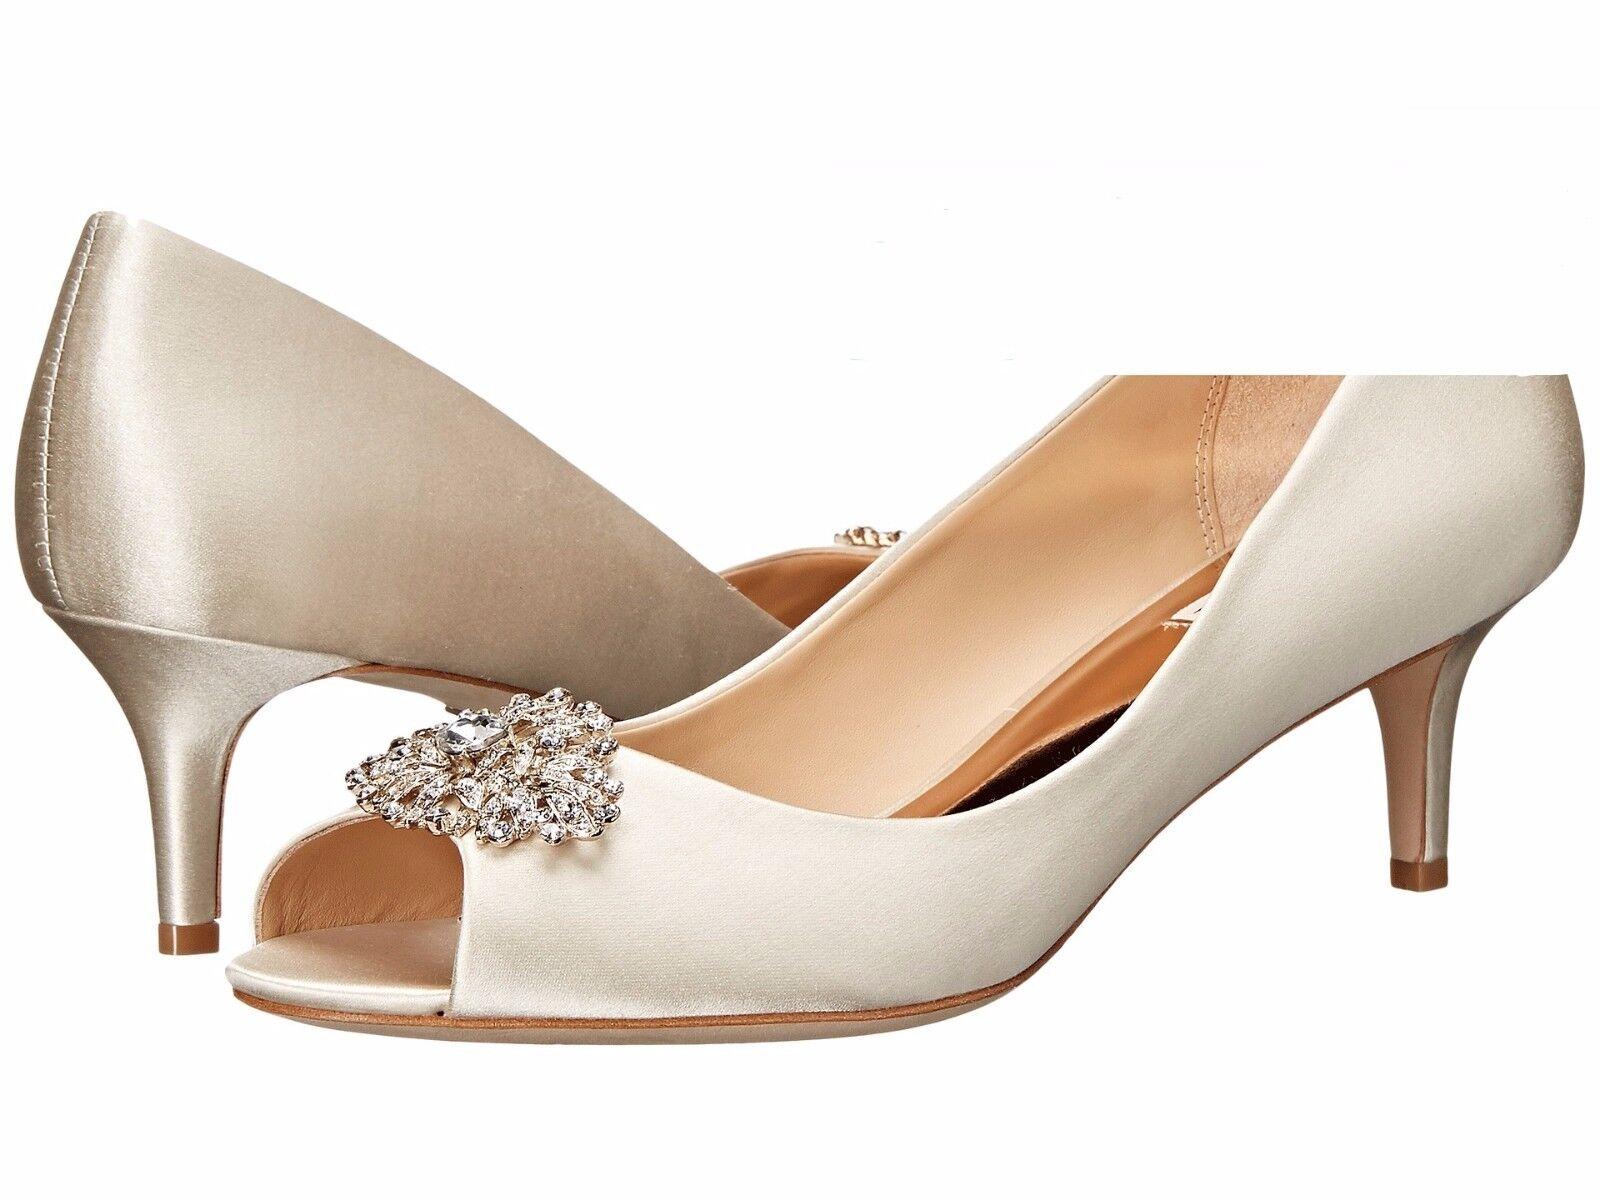 Badgley Mischka Layla Größe 6 Ivory Satin Crystal Embellished Embellished Embellished Kitten Heel Pumps 3d1580